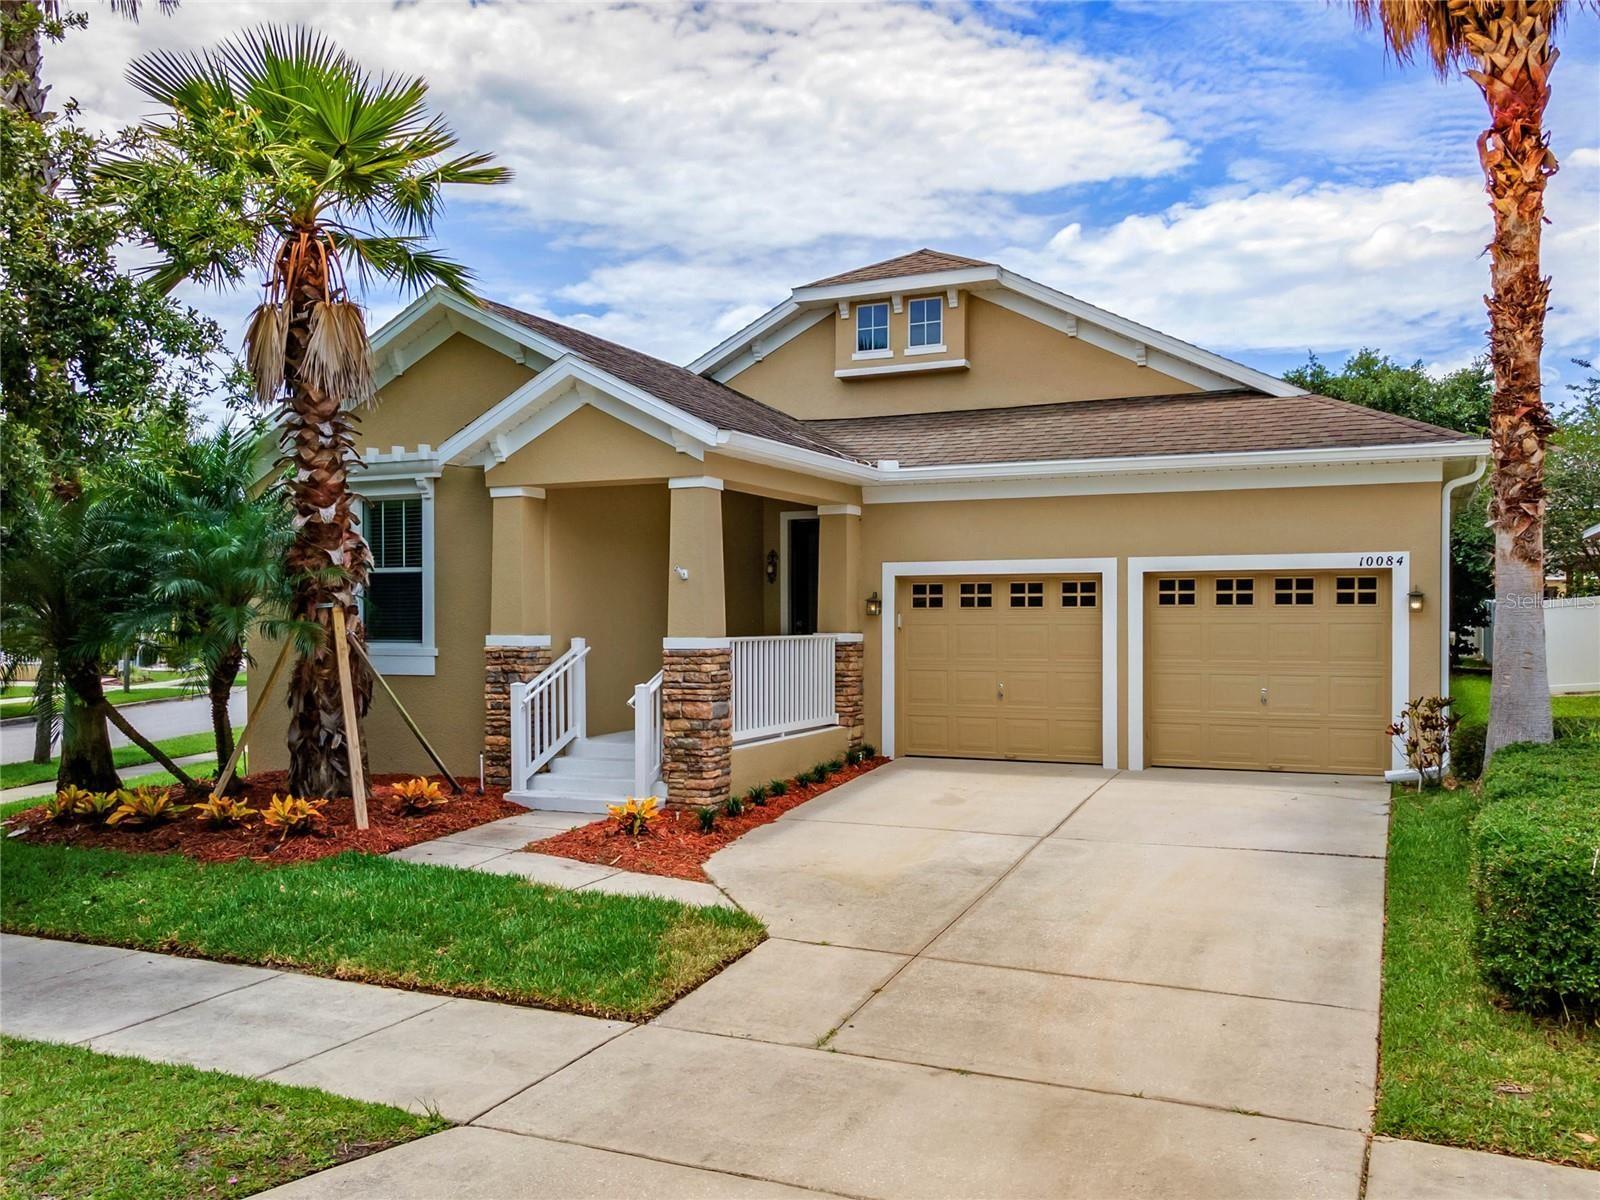 10084 KIMBLE FIELD WAY, Orlando, FL 32827 - MLS#: O5950156